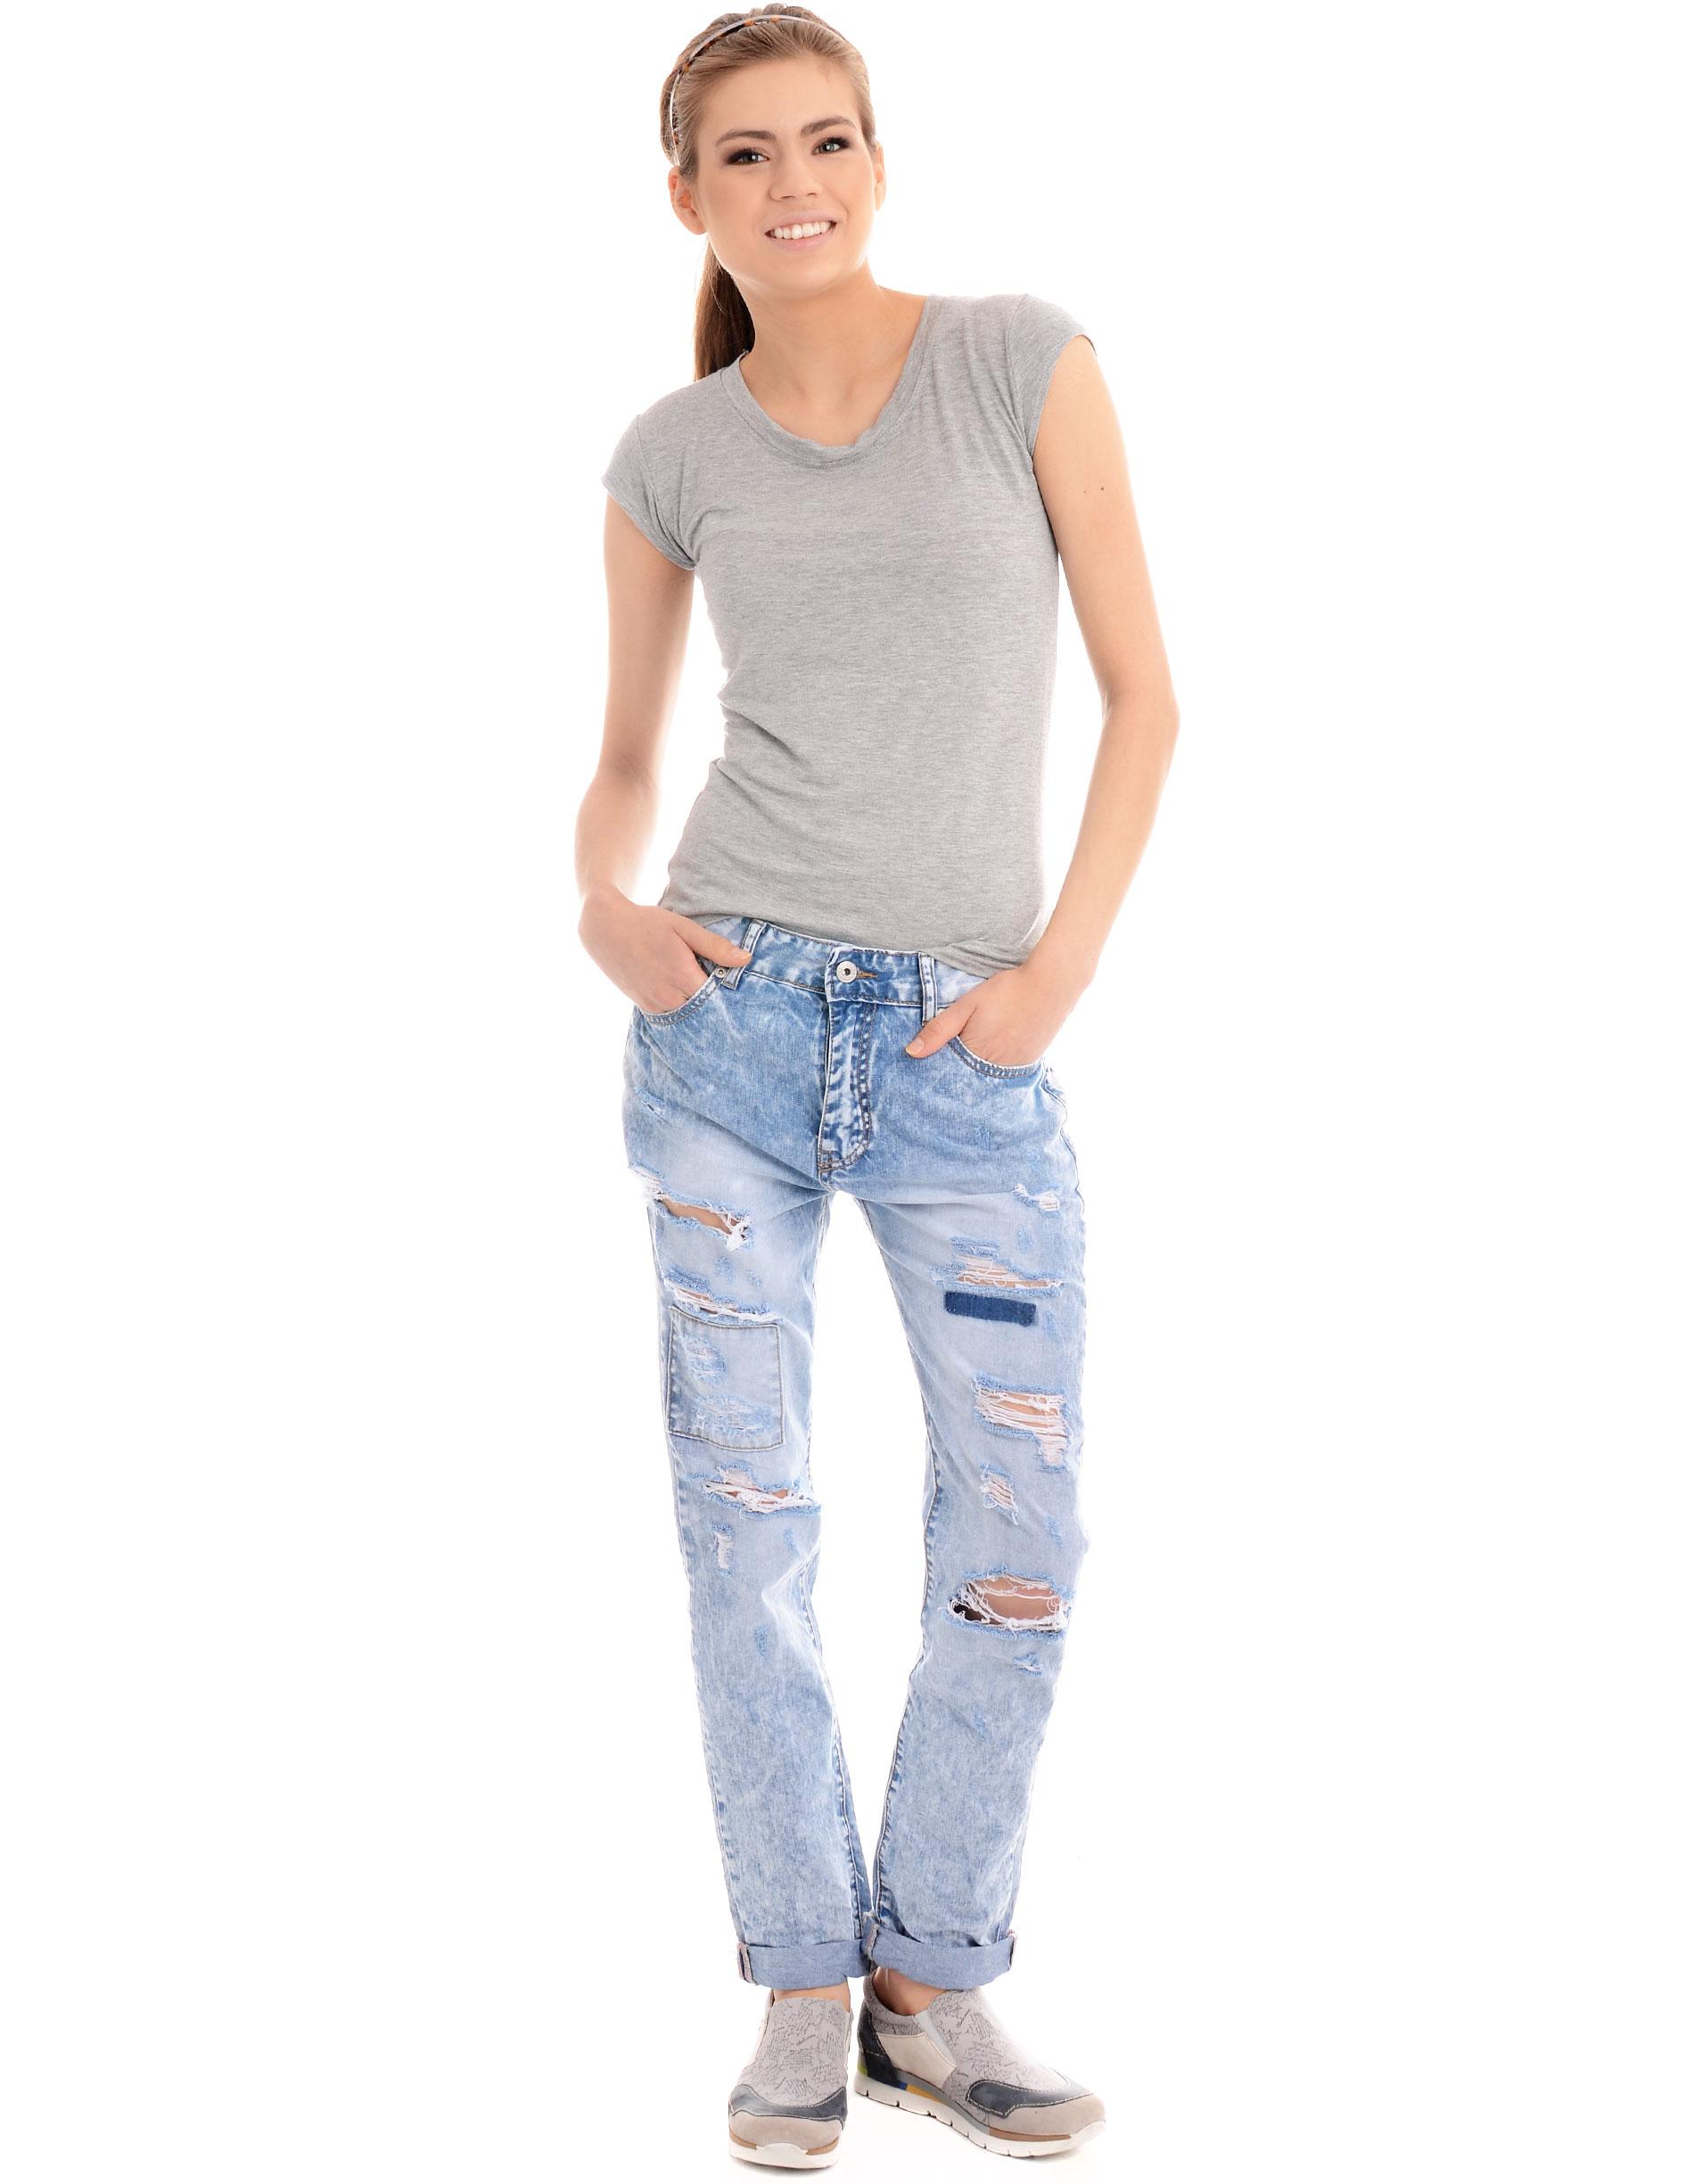 Spodnie - 92-ML1322 JEA - Unisono